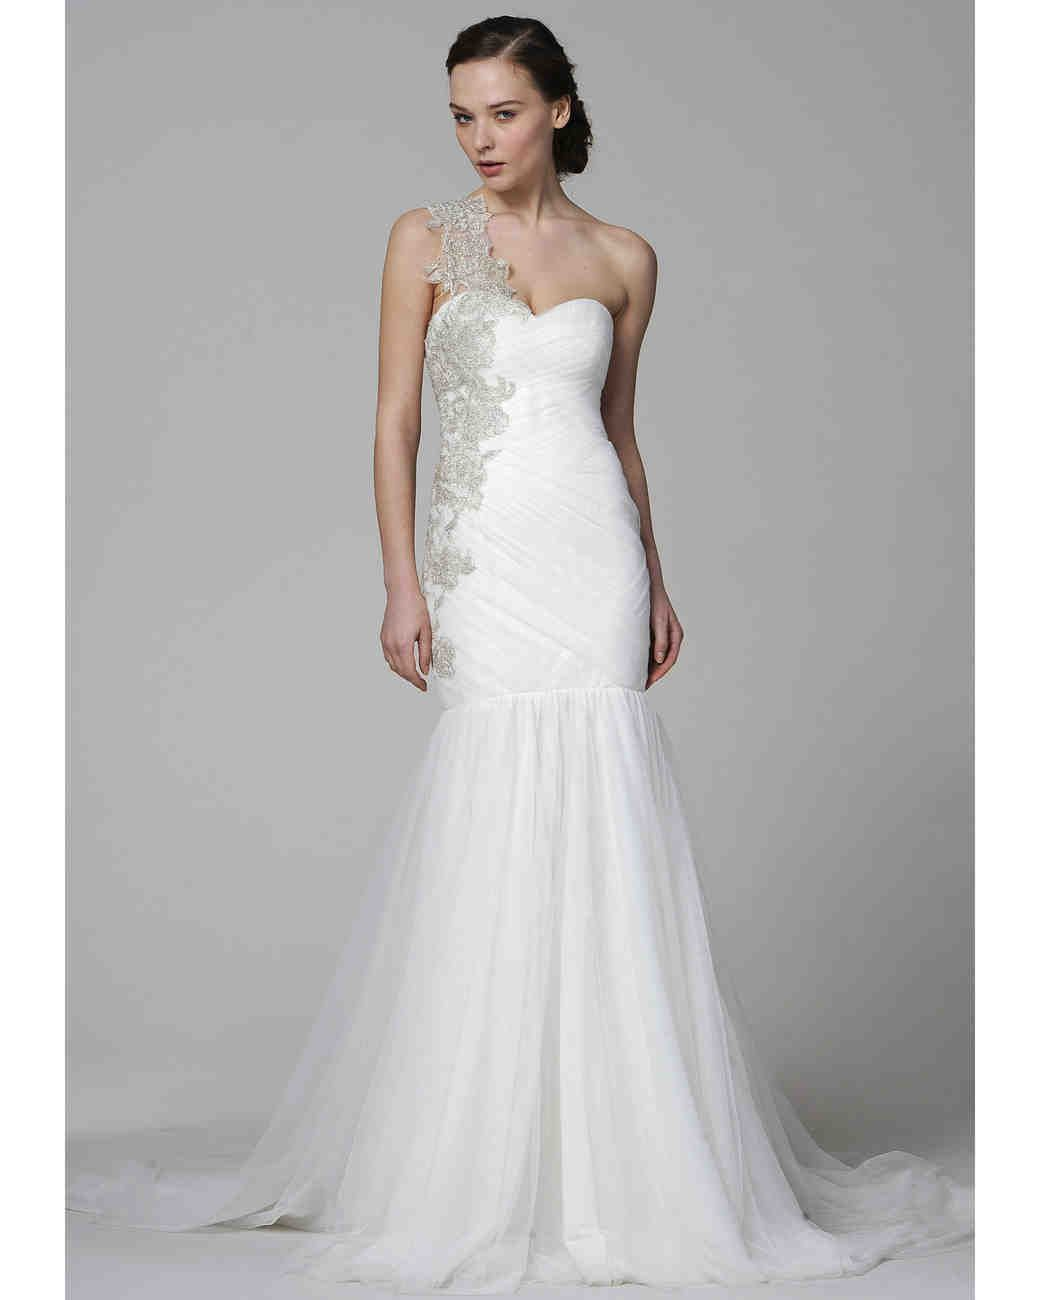 50+ One Strap Wedding Dress - Wedding Dresses for the Mature Bride ...